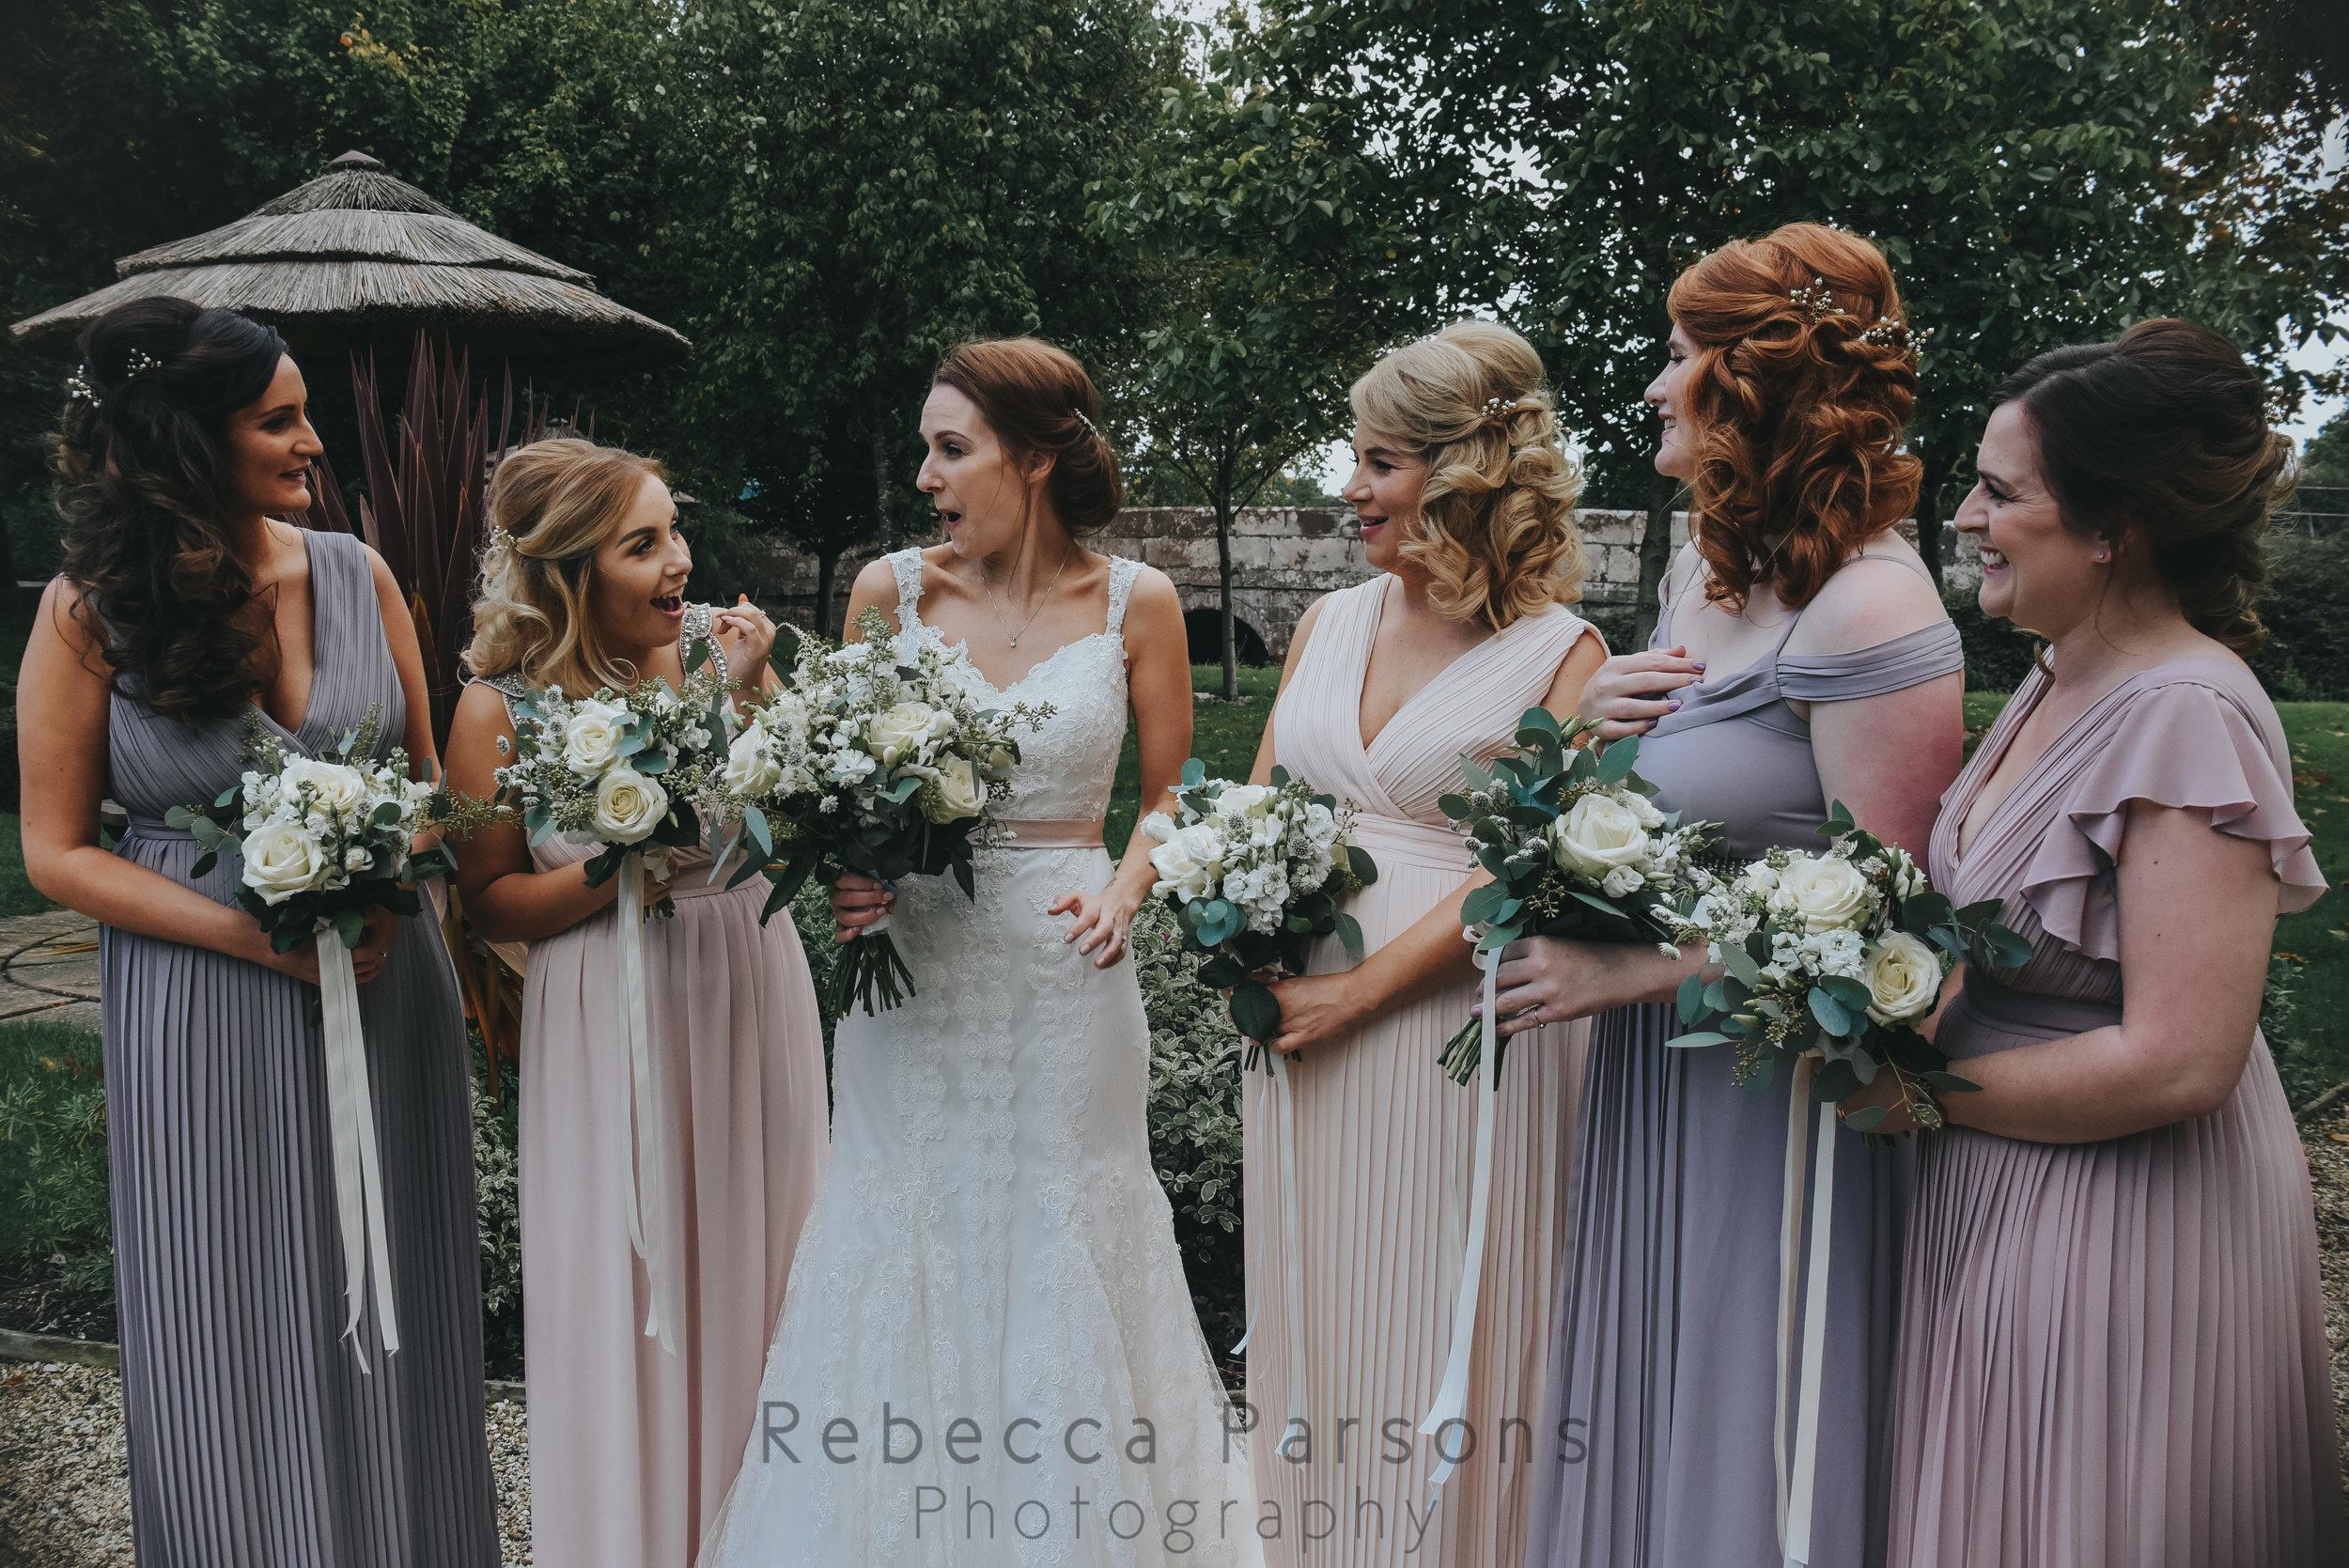 Bride in landscaped gardens with bridesmaids